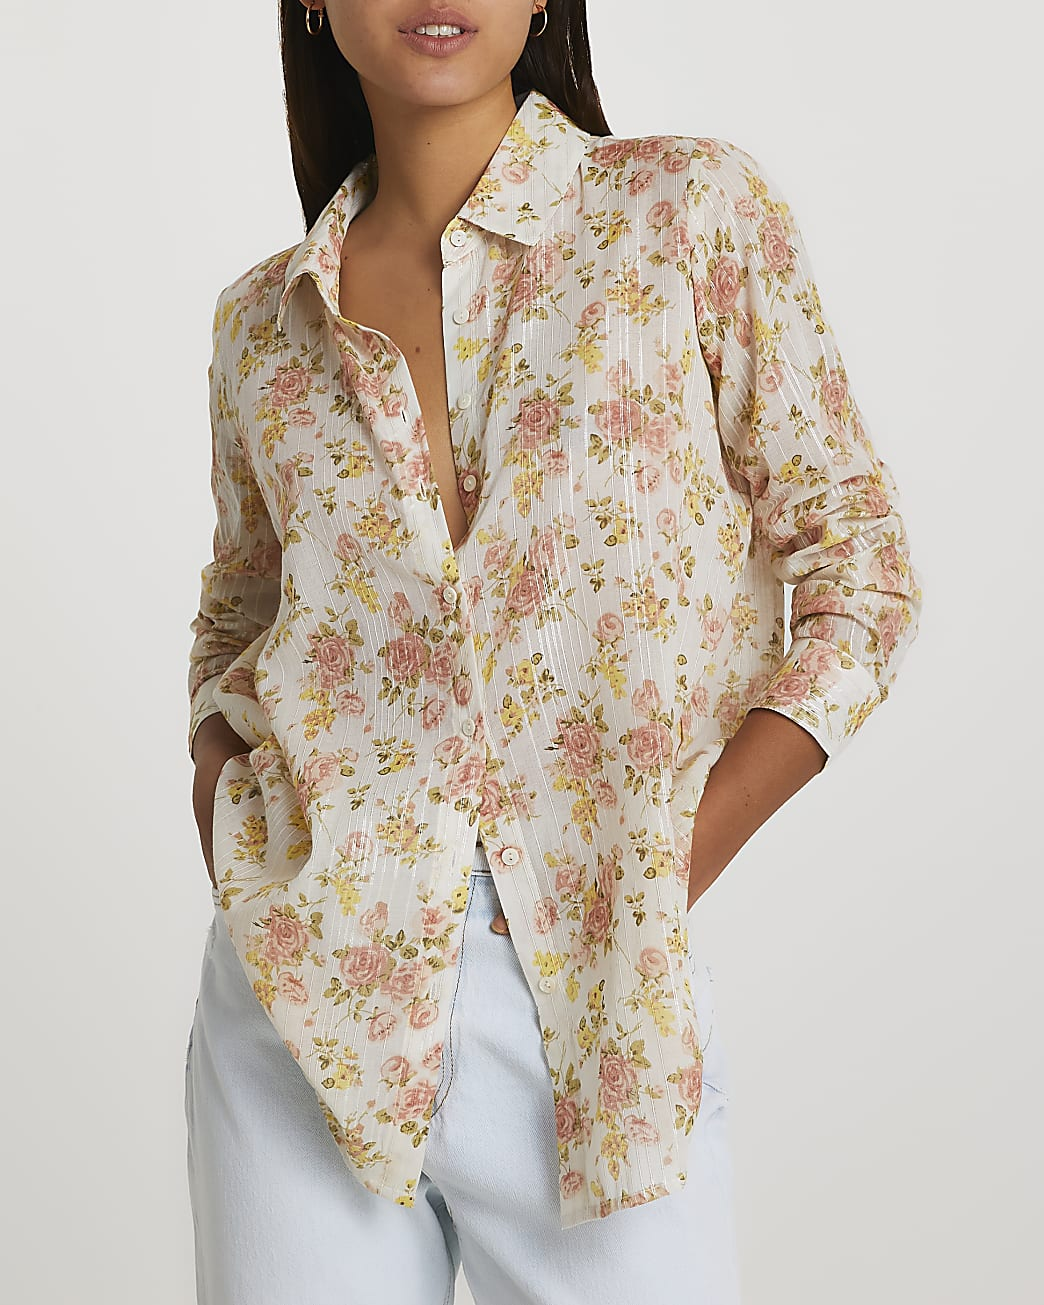 Orange floral print shirt